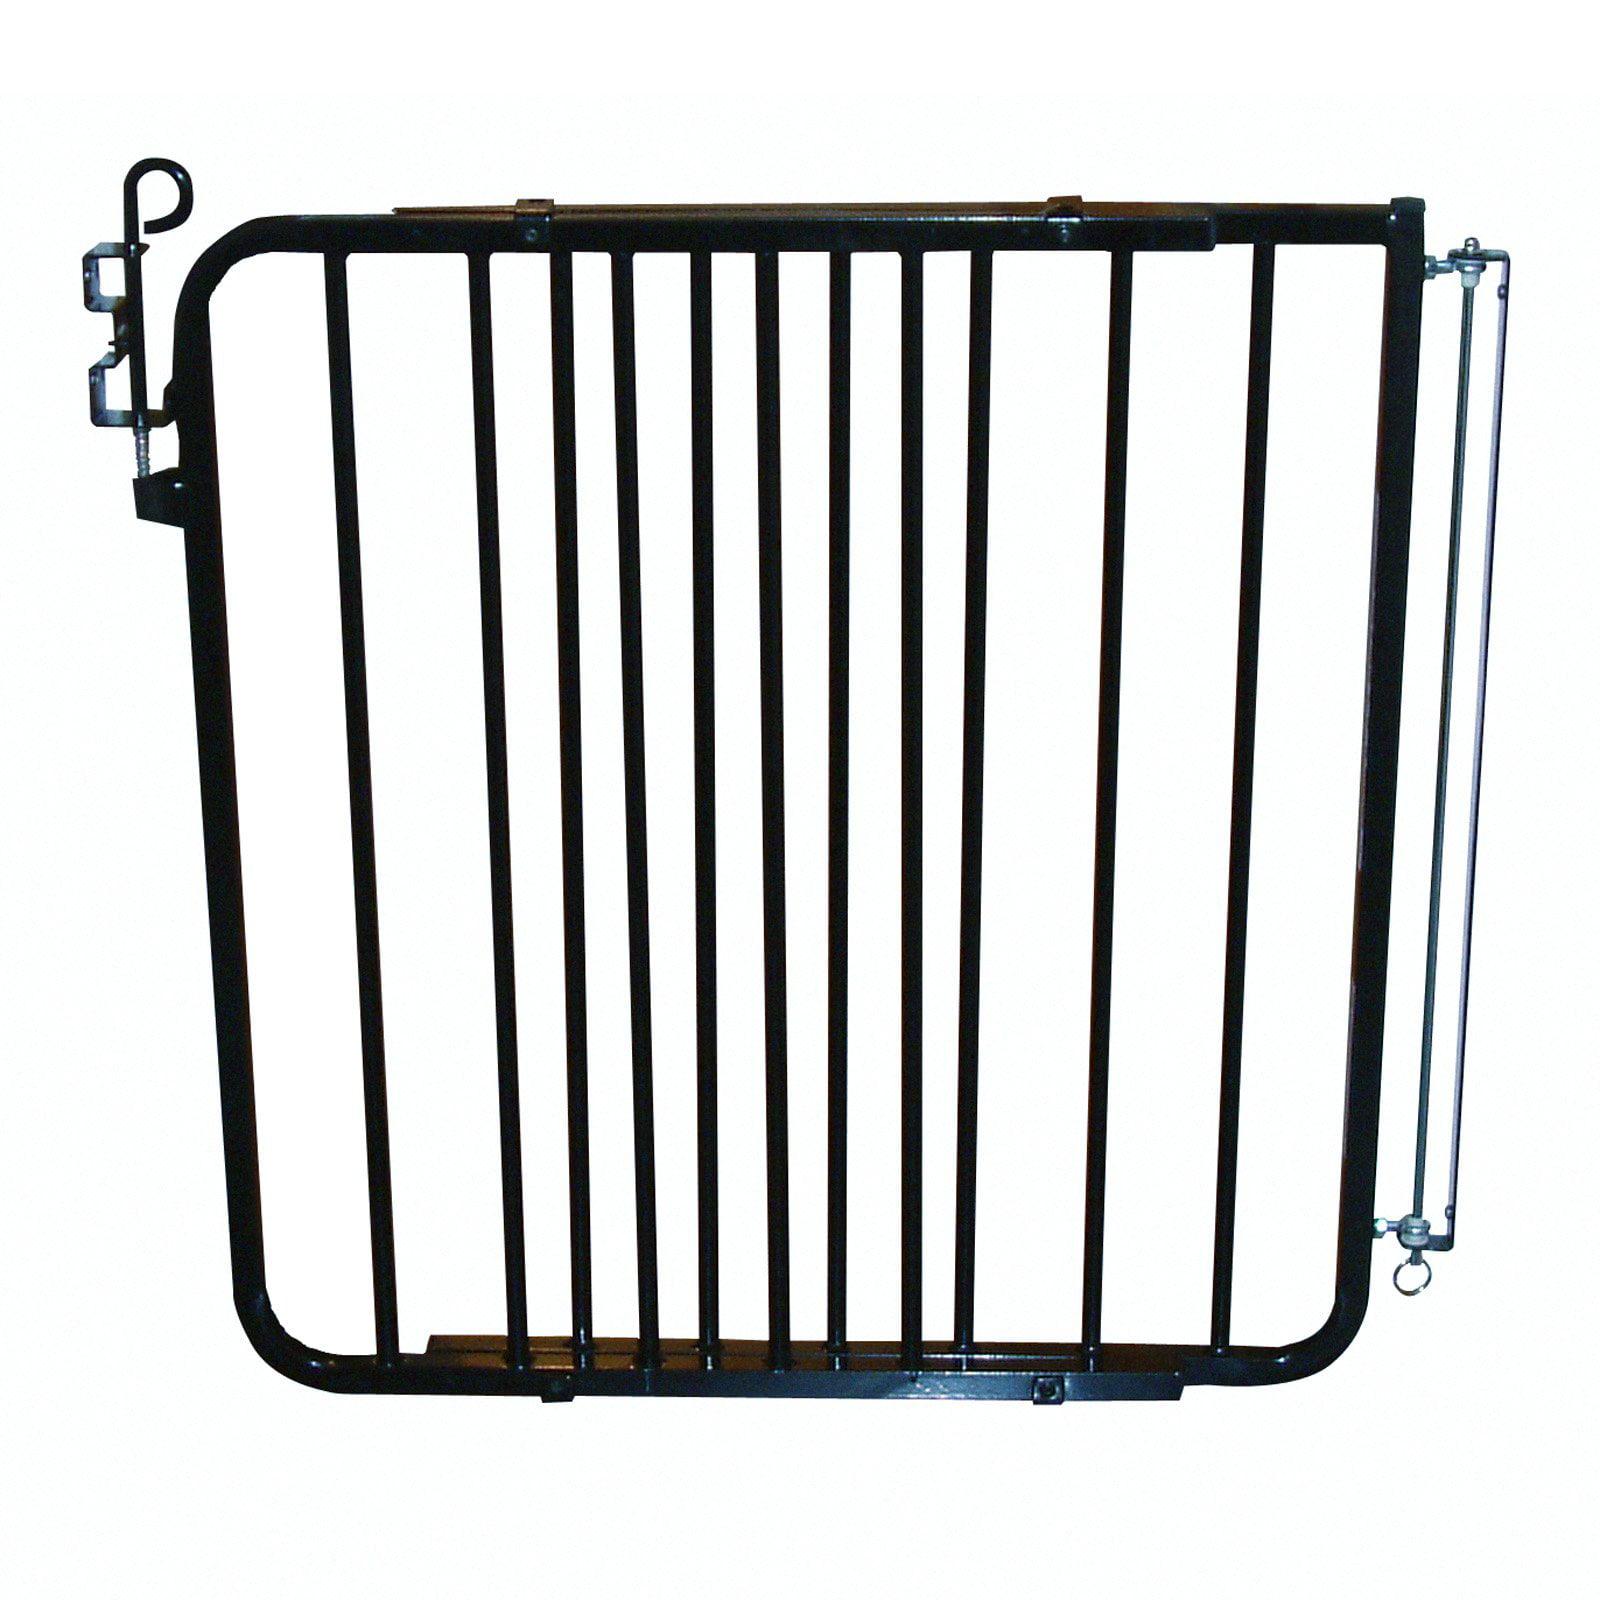 Cardinal Gates Autolock Child Safety Gate by Cardinal Gates